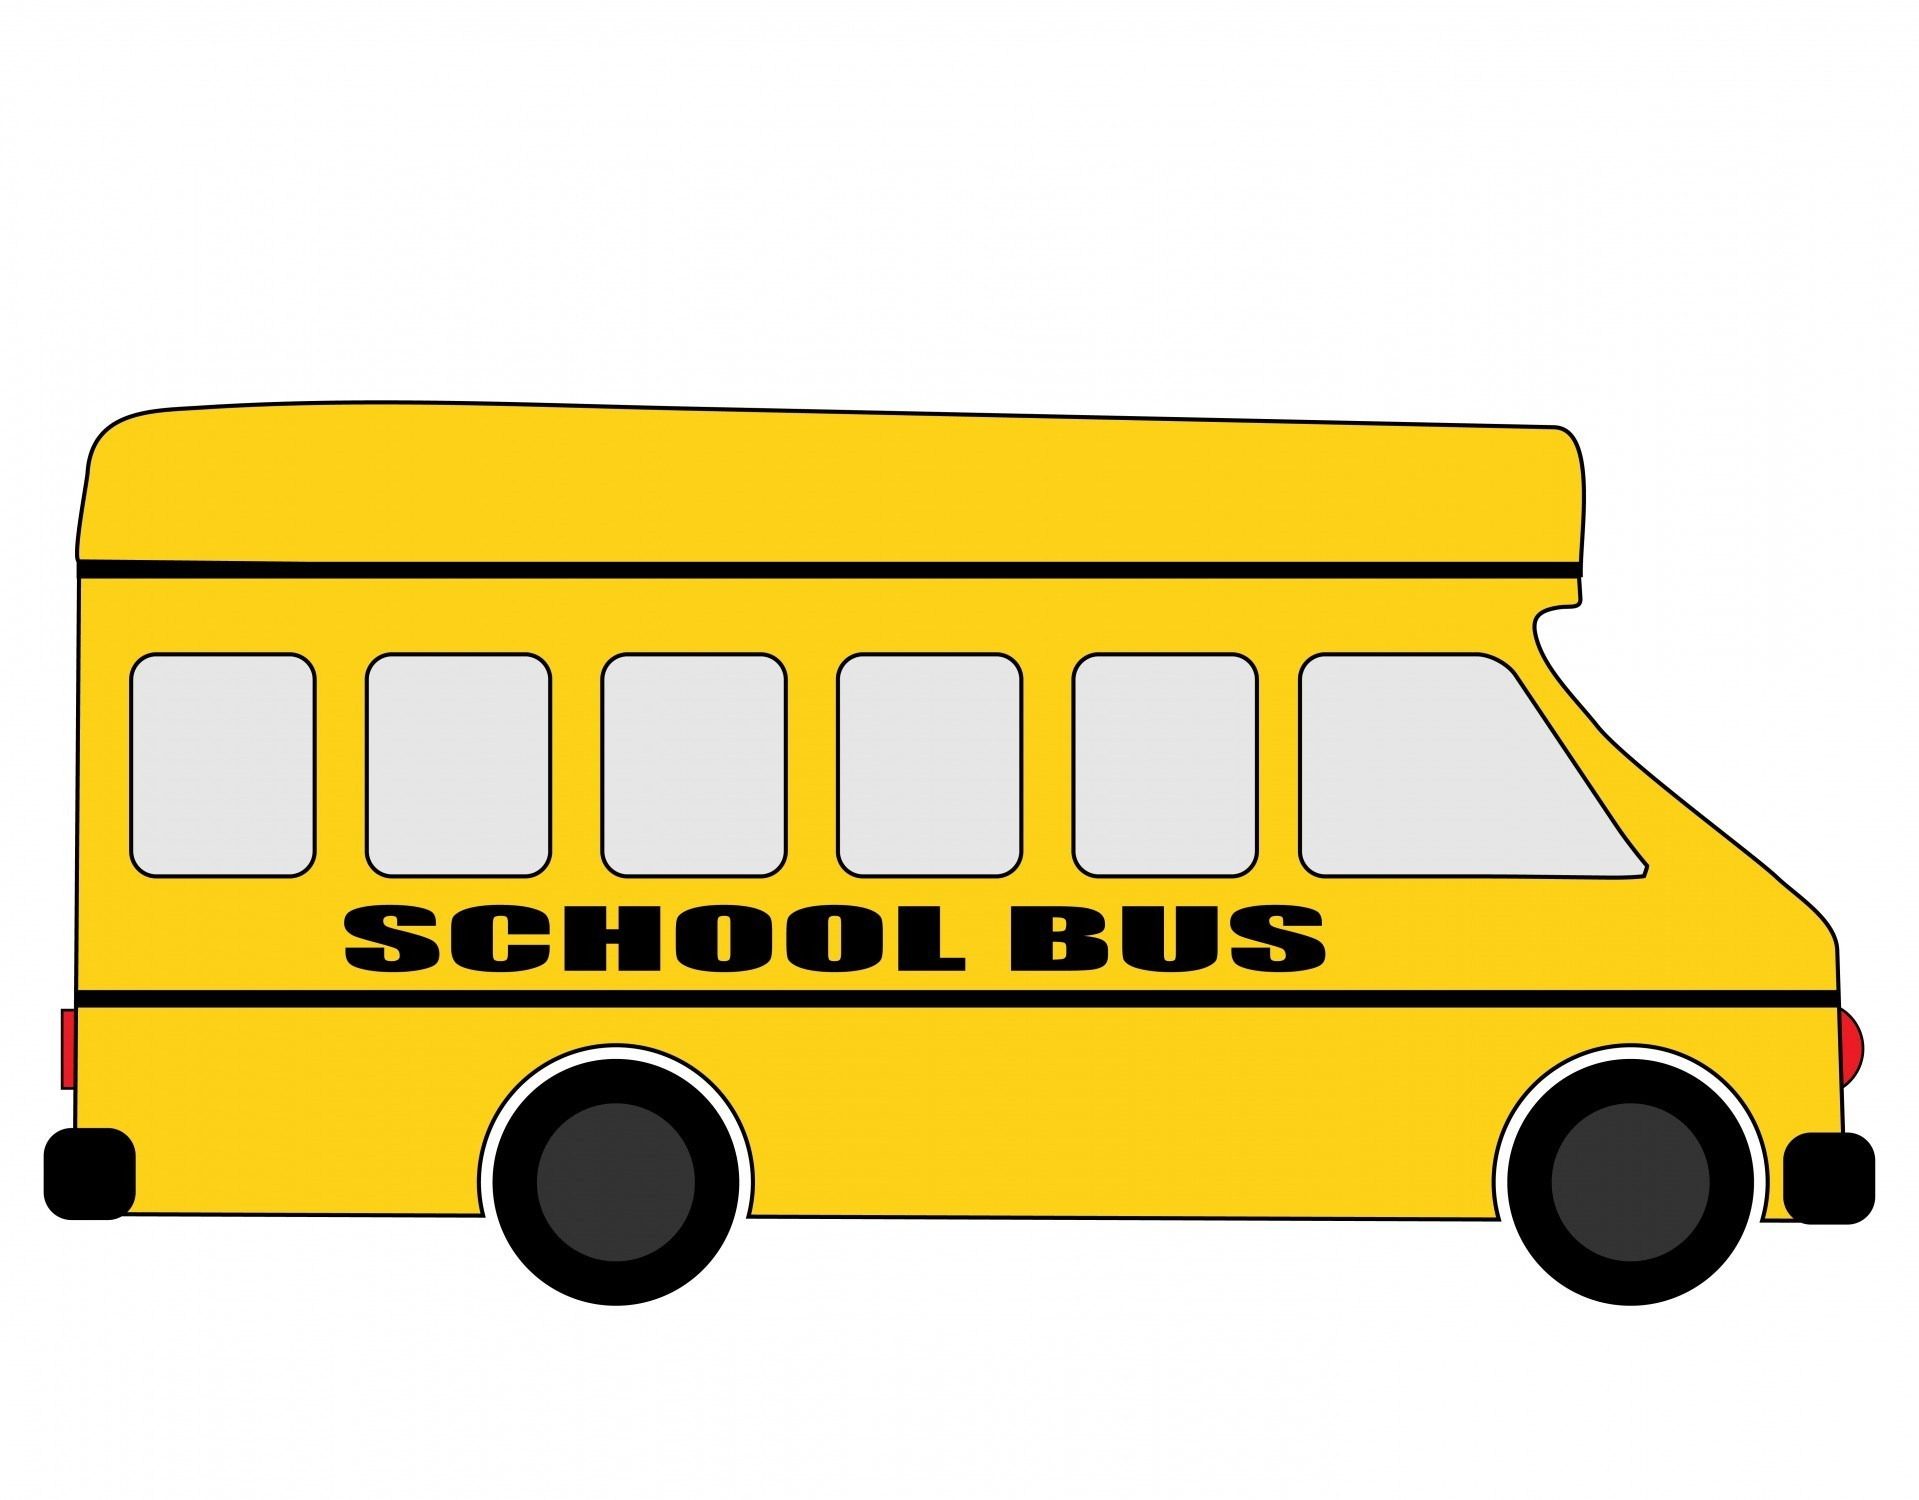 School is on its way!